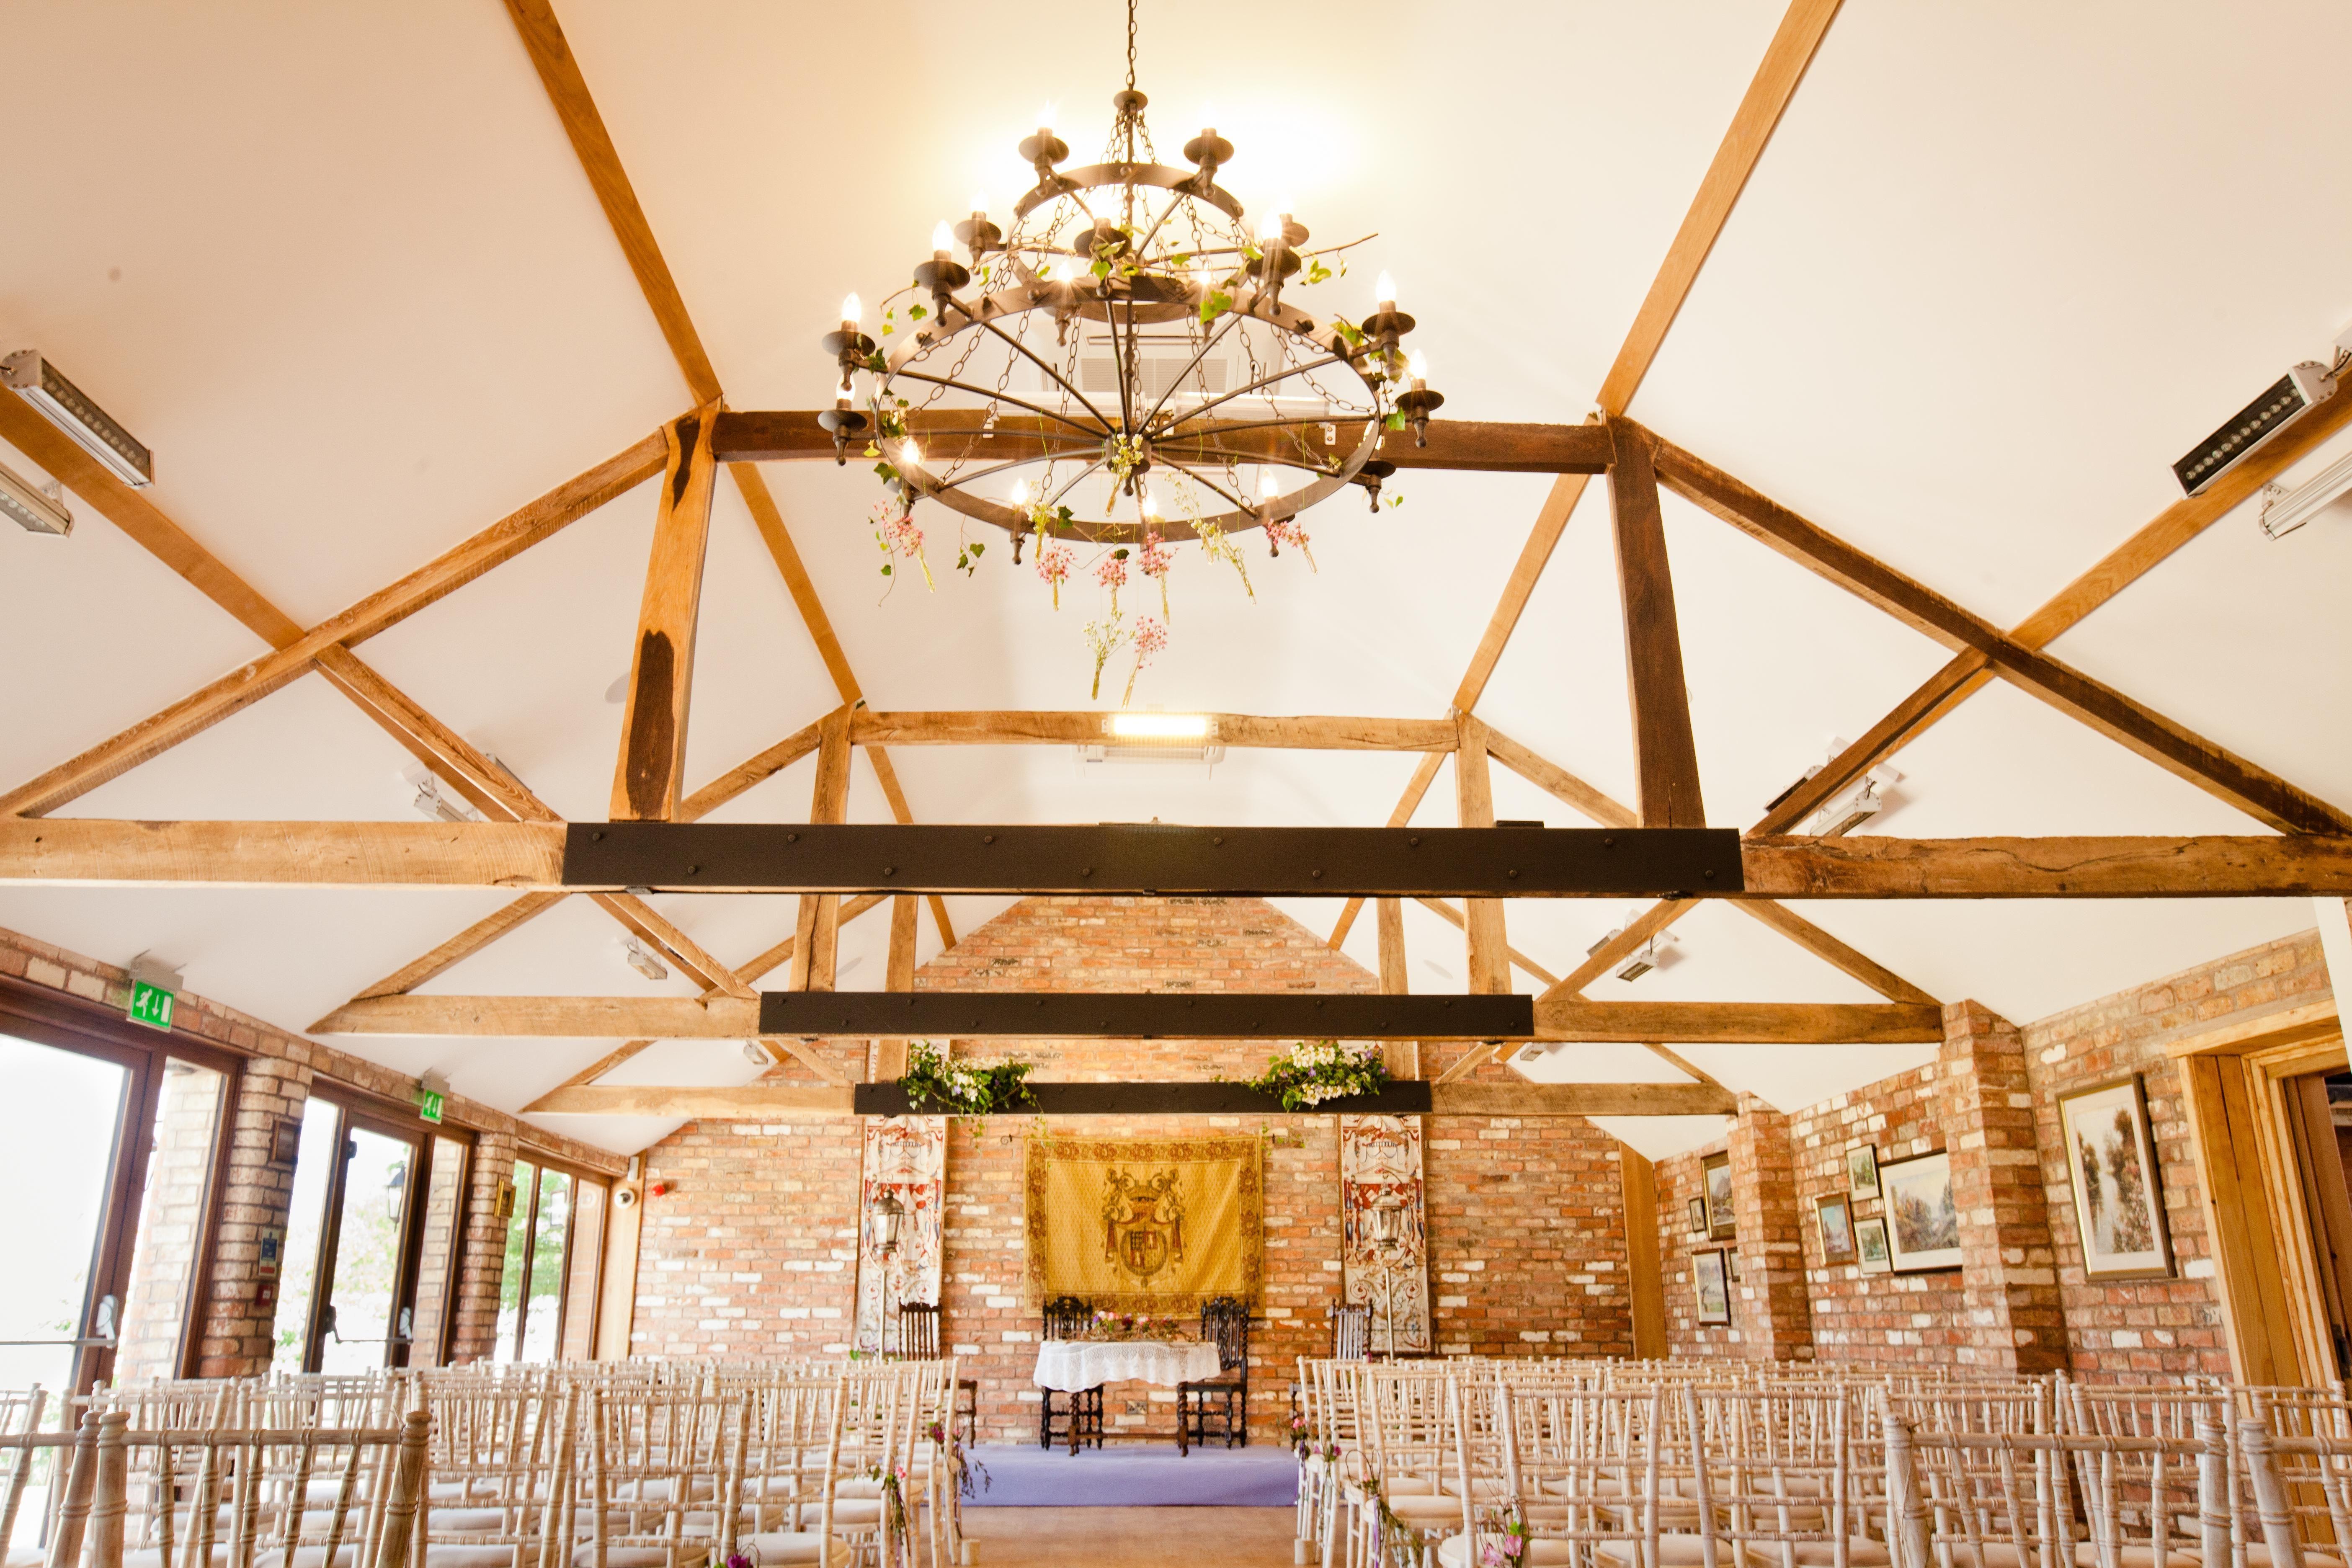 Keythorpe Manor Wedding Venues LeicestershireThe OaksBarnsCountry